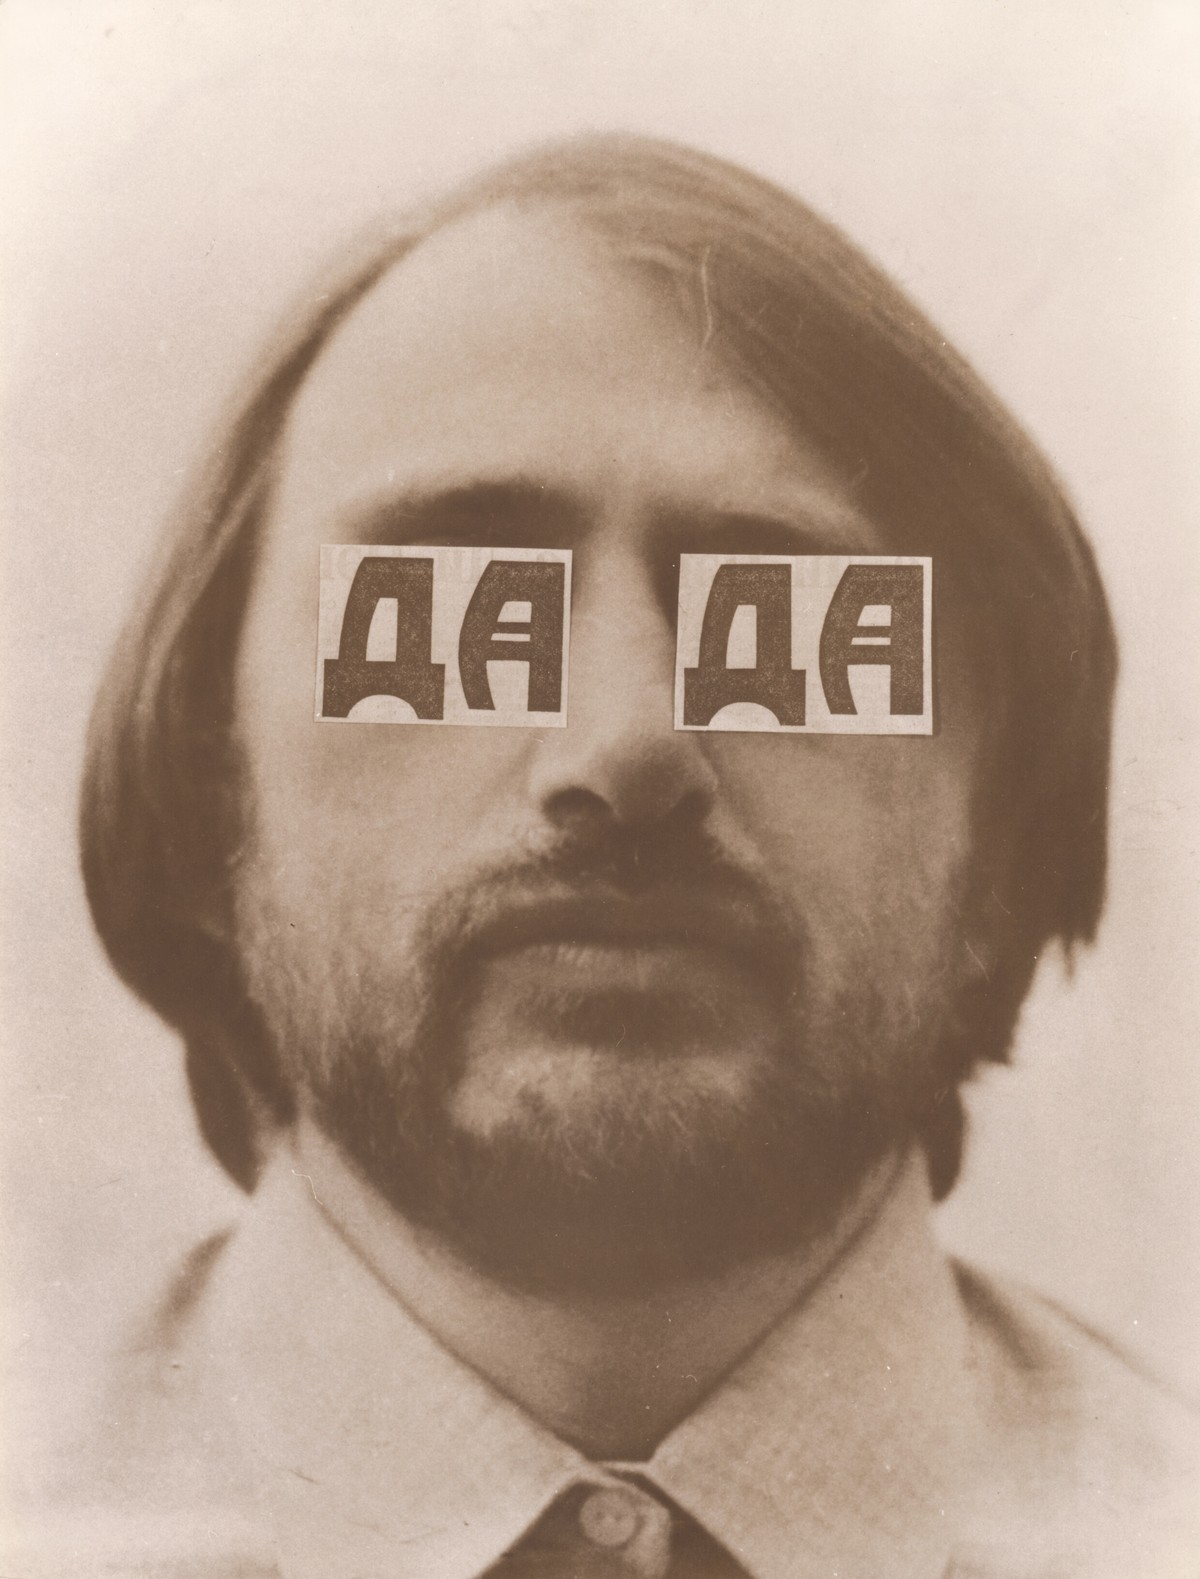 Peter Rónai, Alter ego. 1988. Slovenská národná galéria